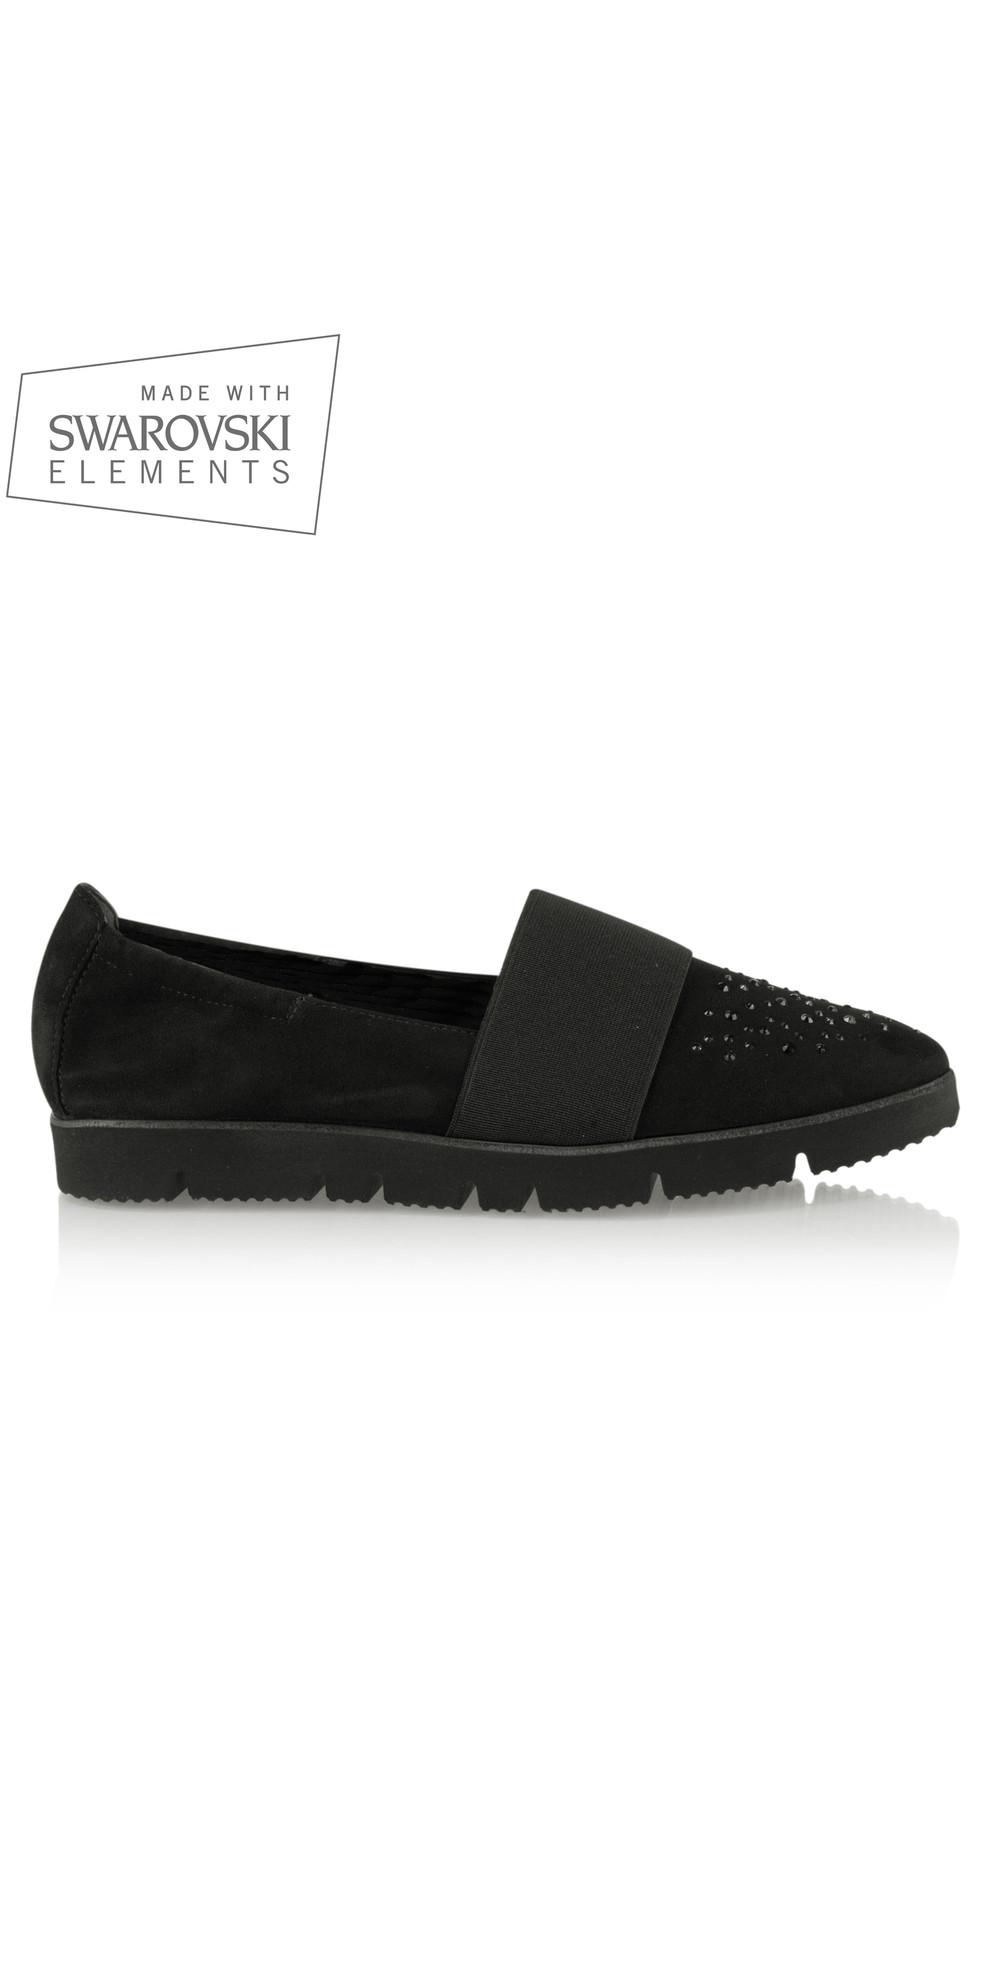 kennel und schmenger pia x crystal shoe with swarovski. Black Bedroom Furniture Sets. Home Design Ideas